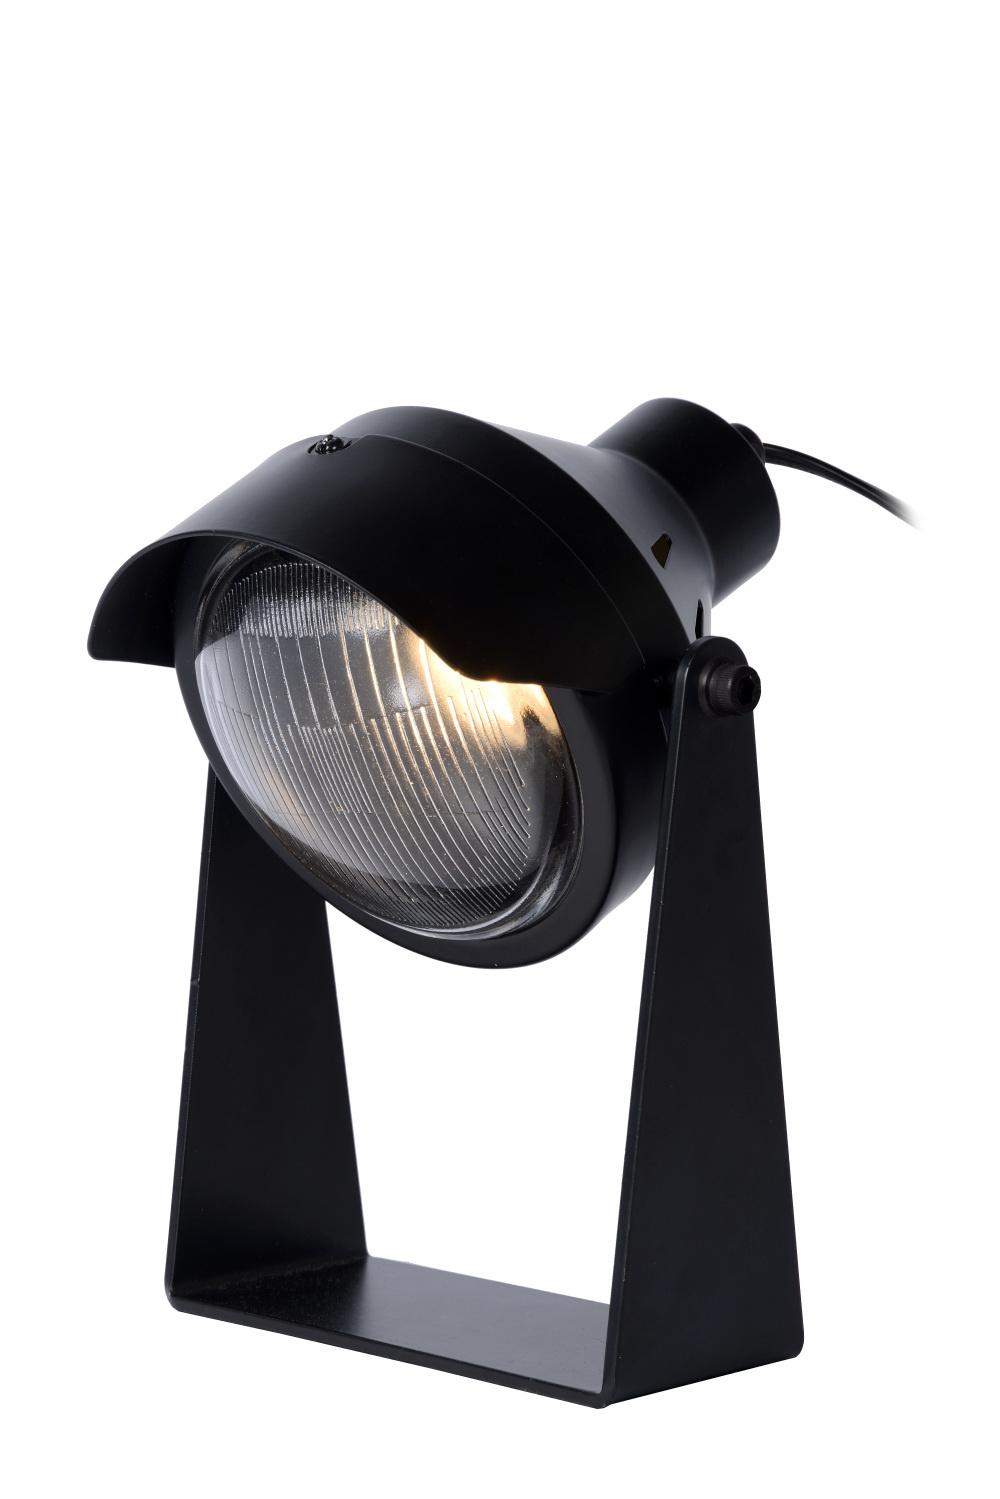 Lucide CICLETA Tafellamp-Zwart-1xGU10-35W-Staal